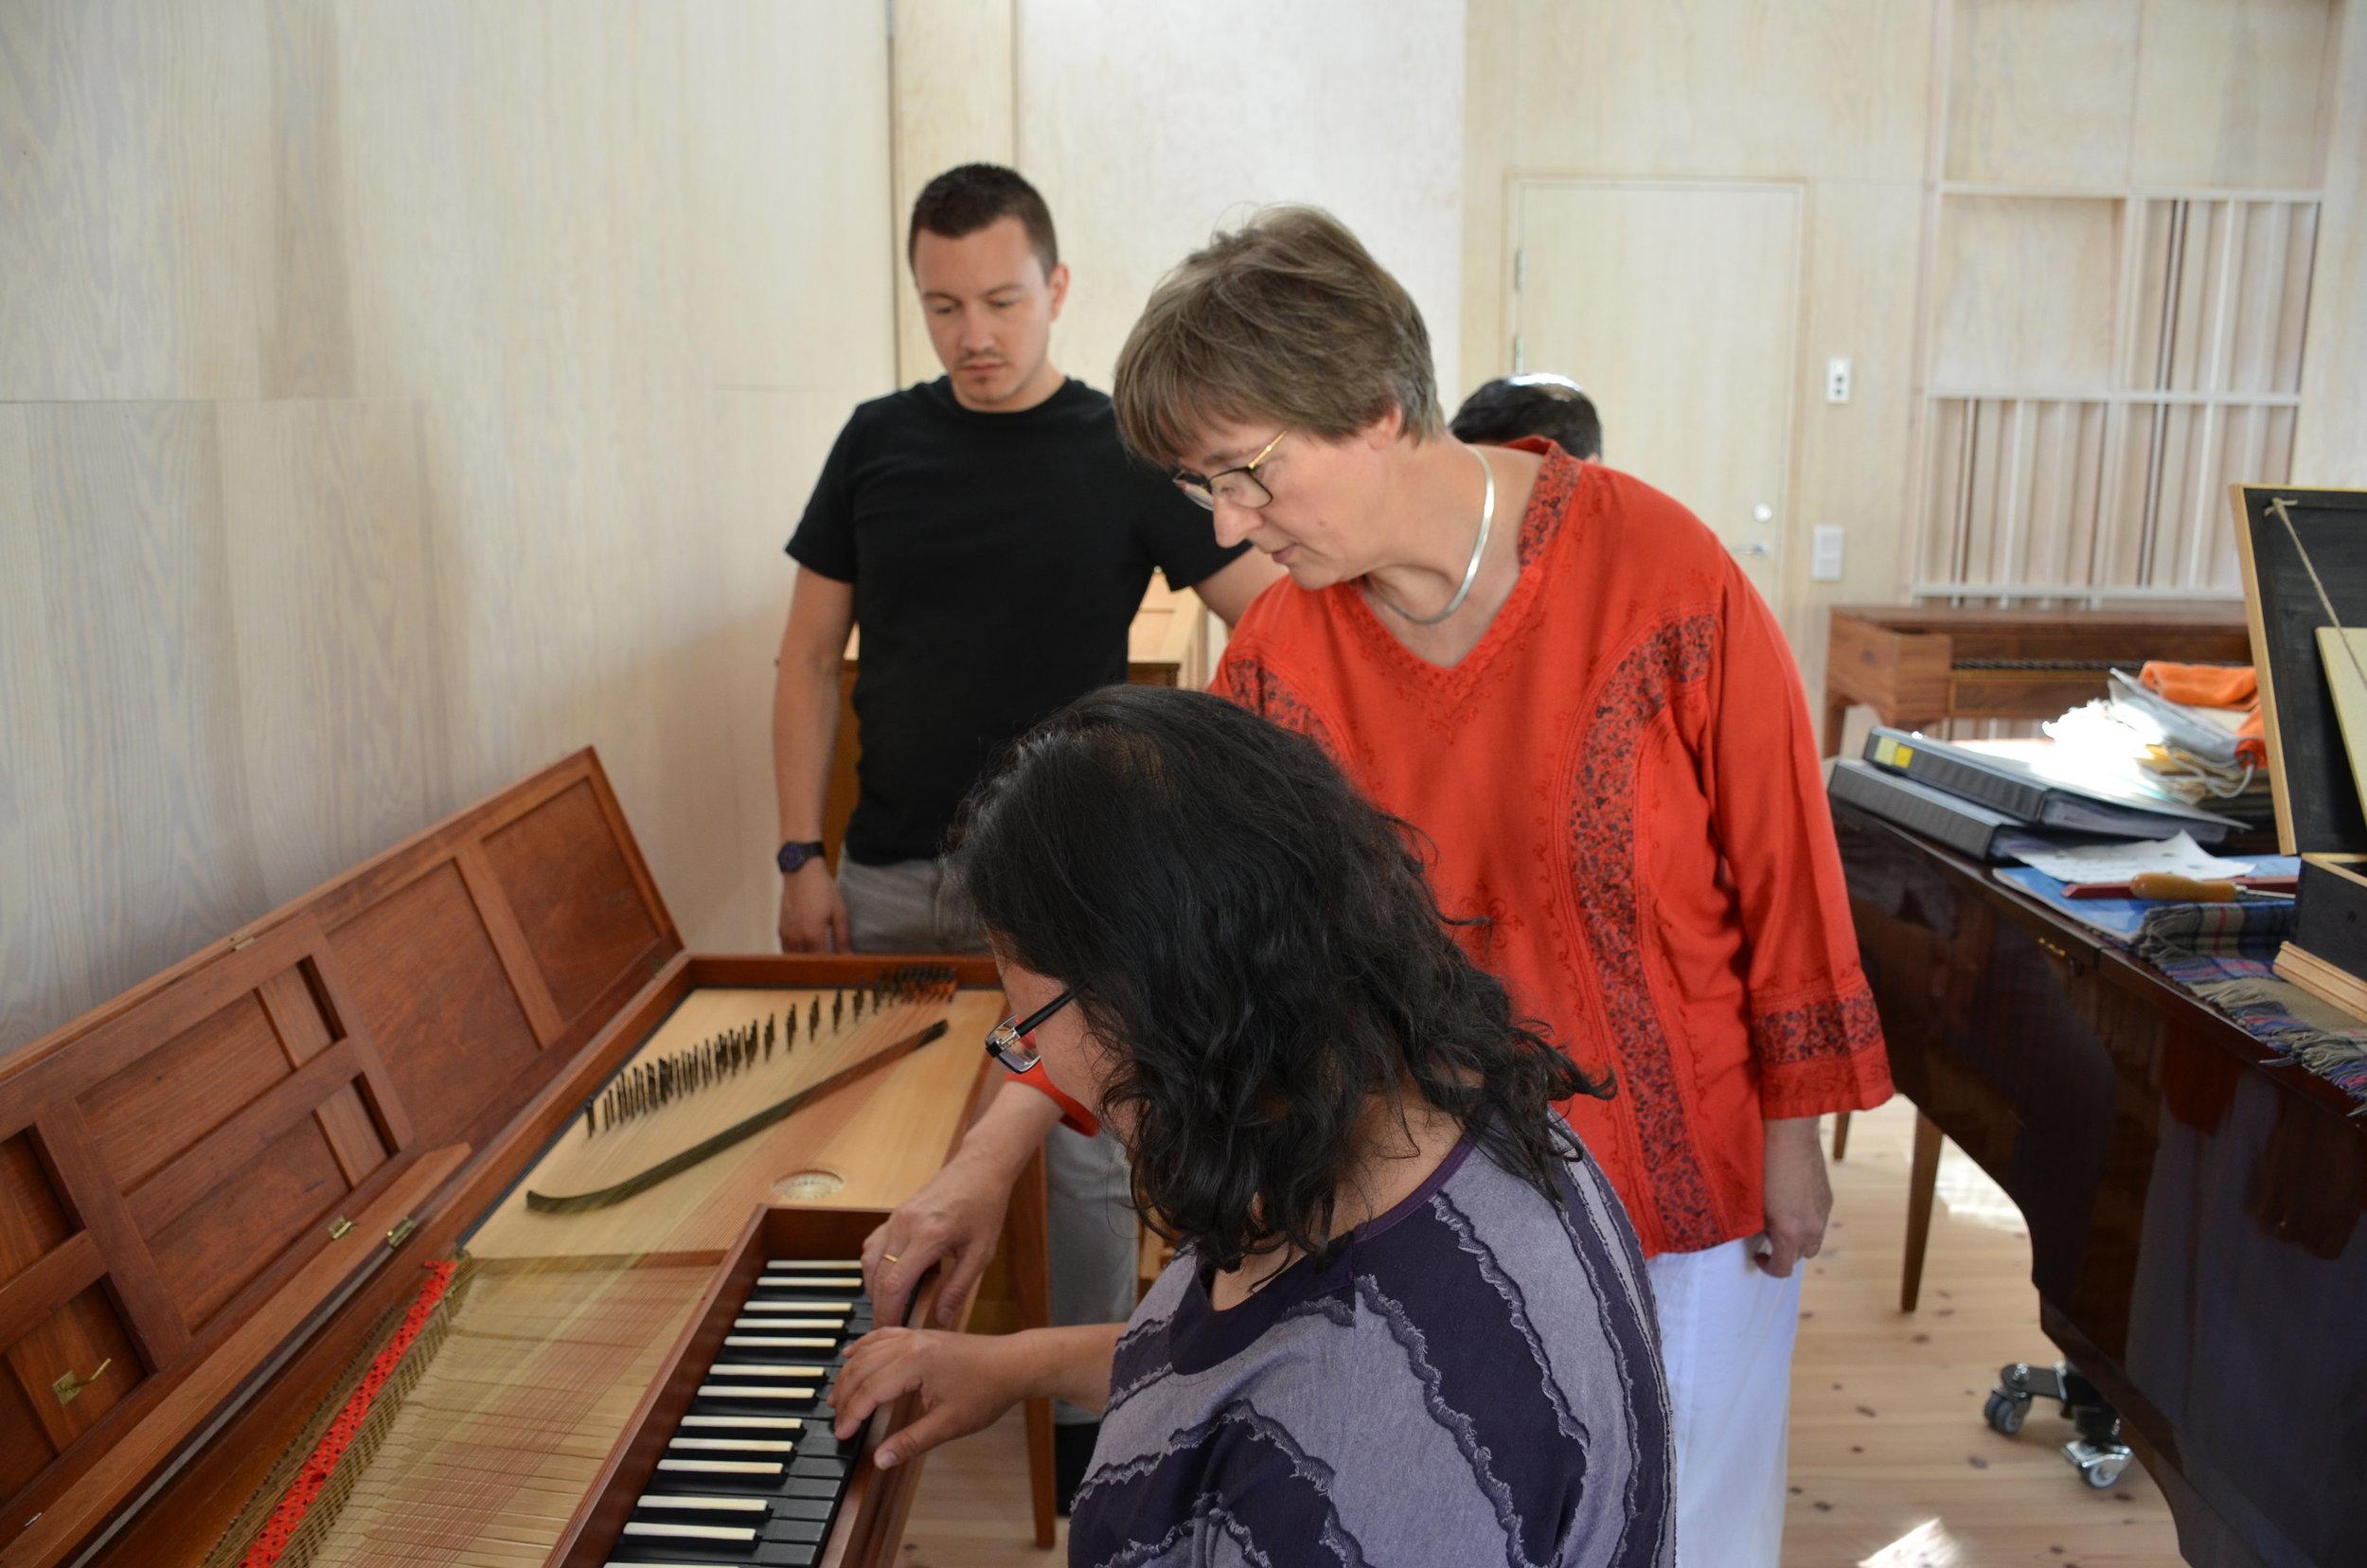 Ulrika Davidsson demonstrates proper clavichord technique.